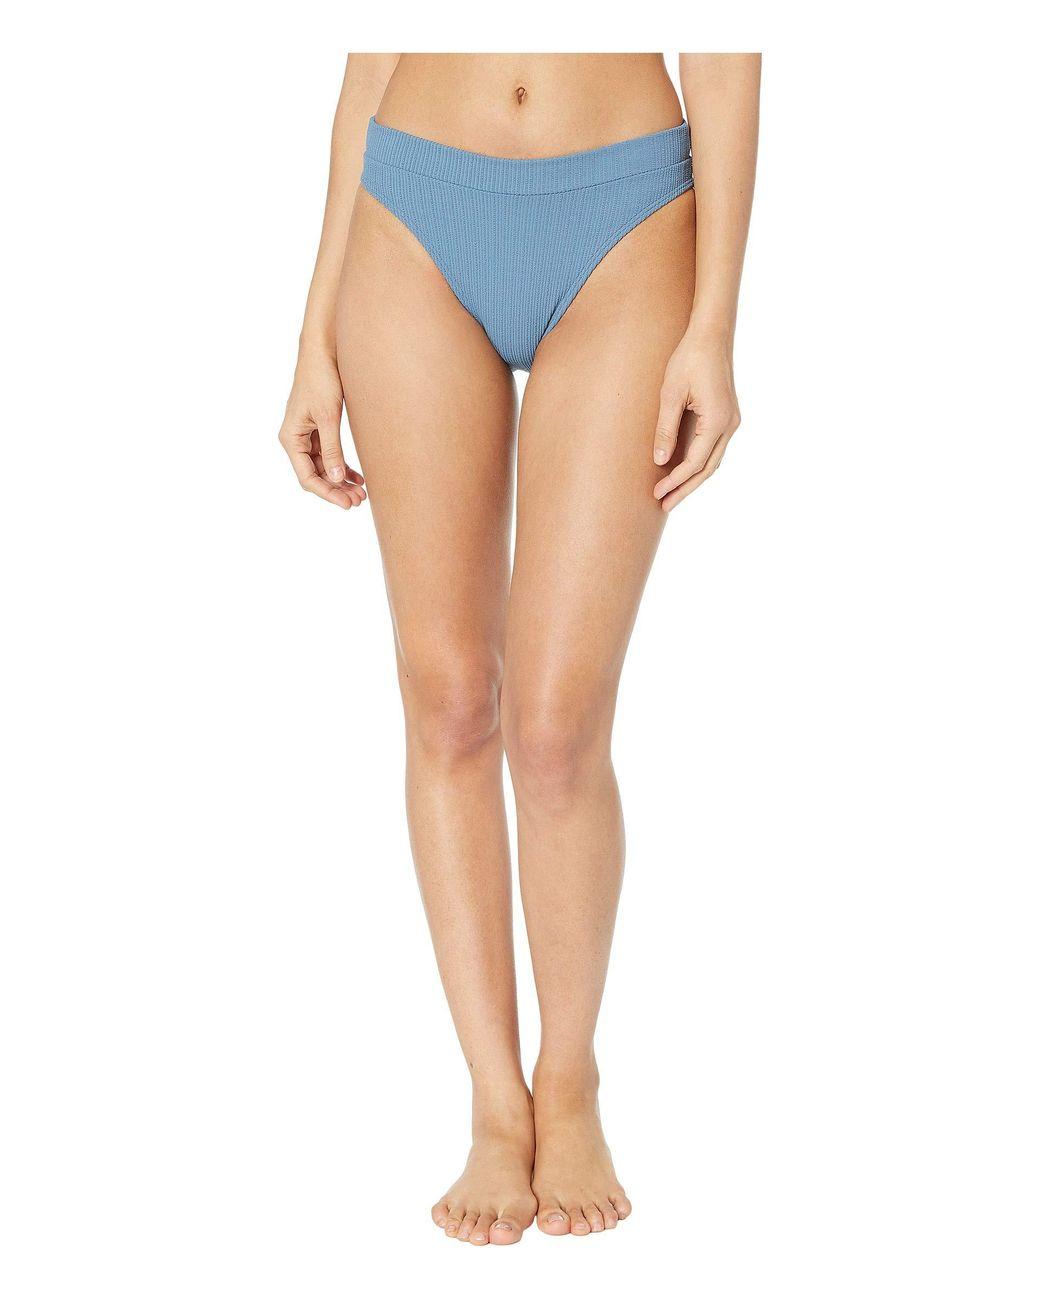 c0f432a9ed2b0 Luli Fama. Blue Jagged Bombshell High Leg Banded Waist Bottom (olas)  Women's Swimwear